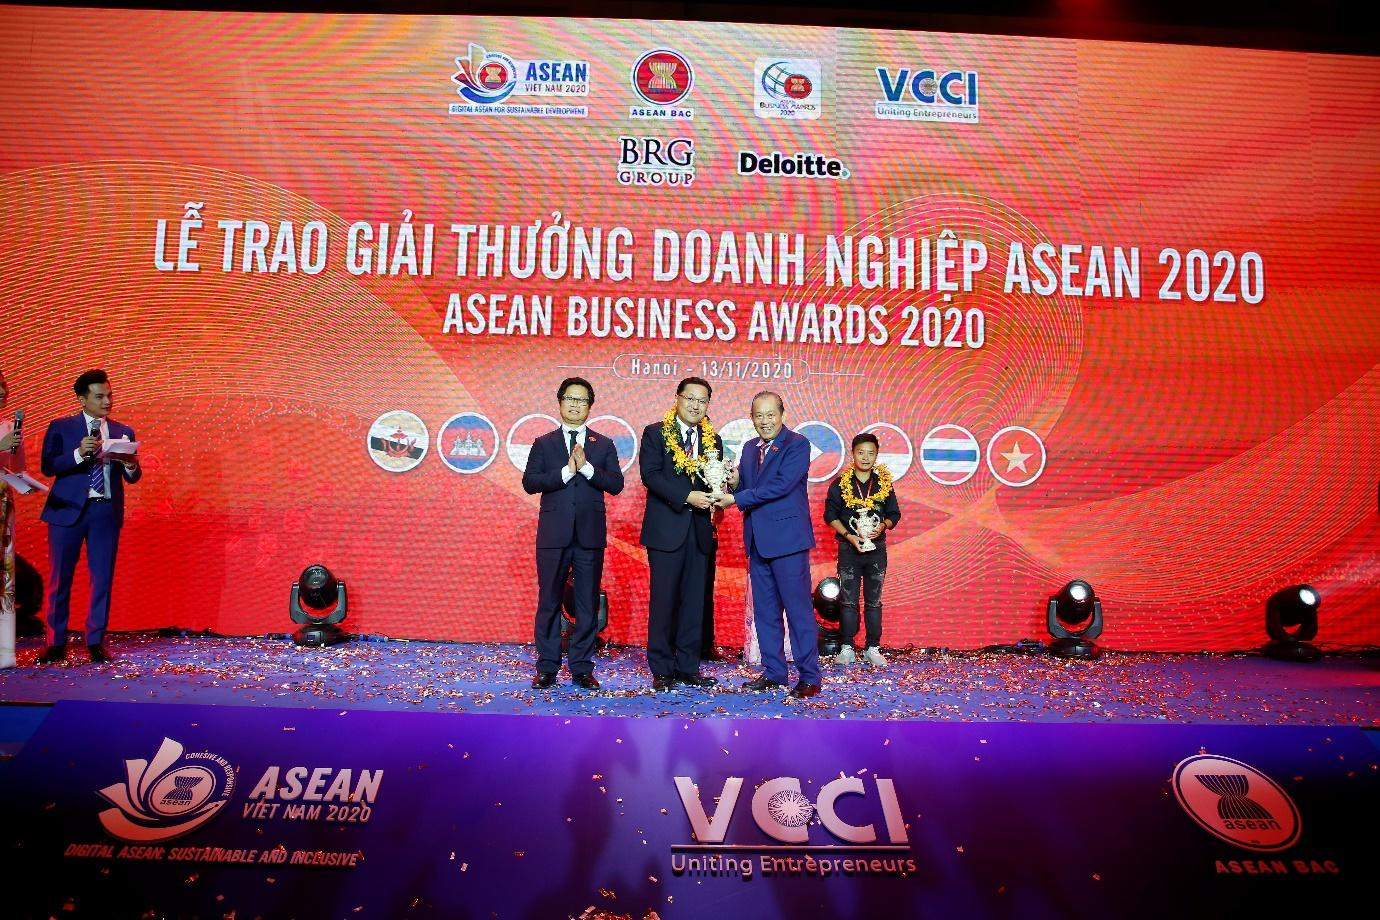 C:\Users\khanh.nh\Desktop\ABAC\ABA 2020\Out TCBC\Doanh nghiệp nhận giải tại sự kiện ABA 2020 (2).JPG